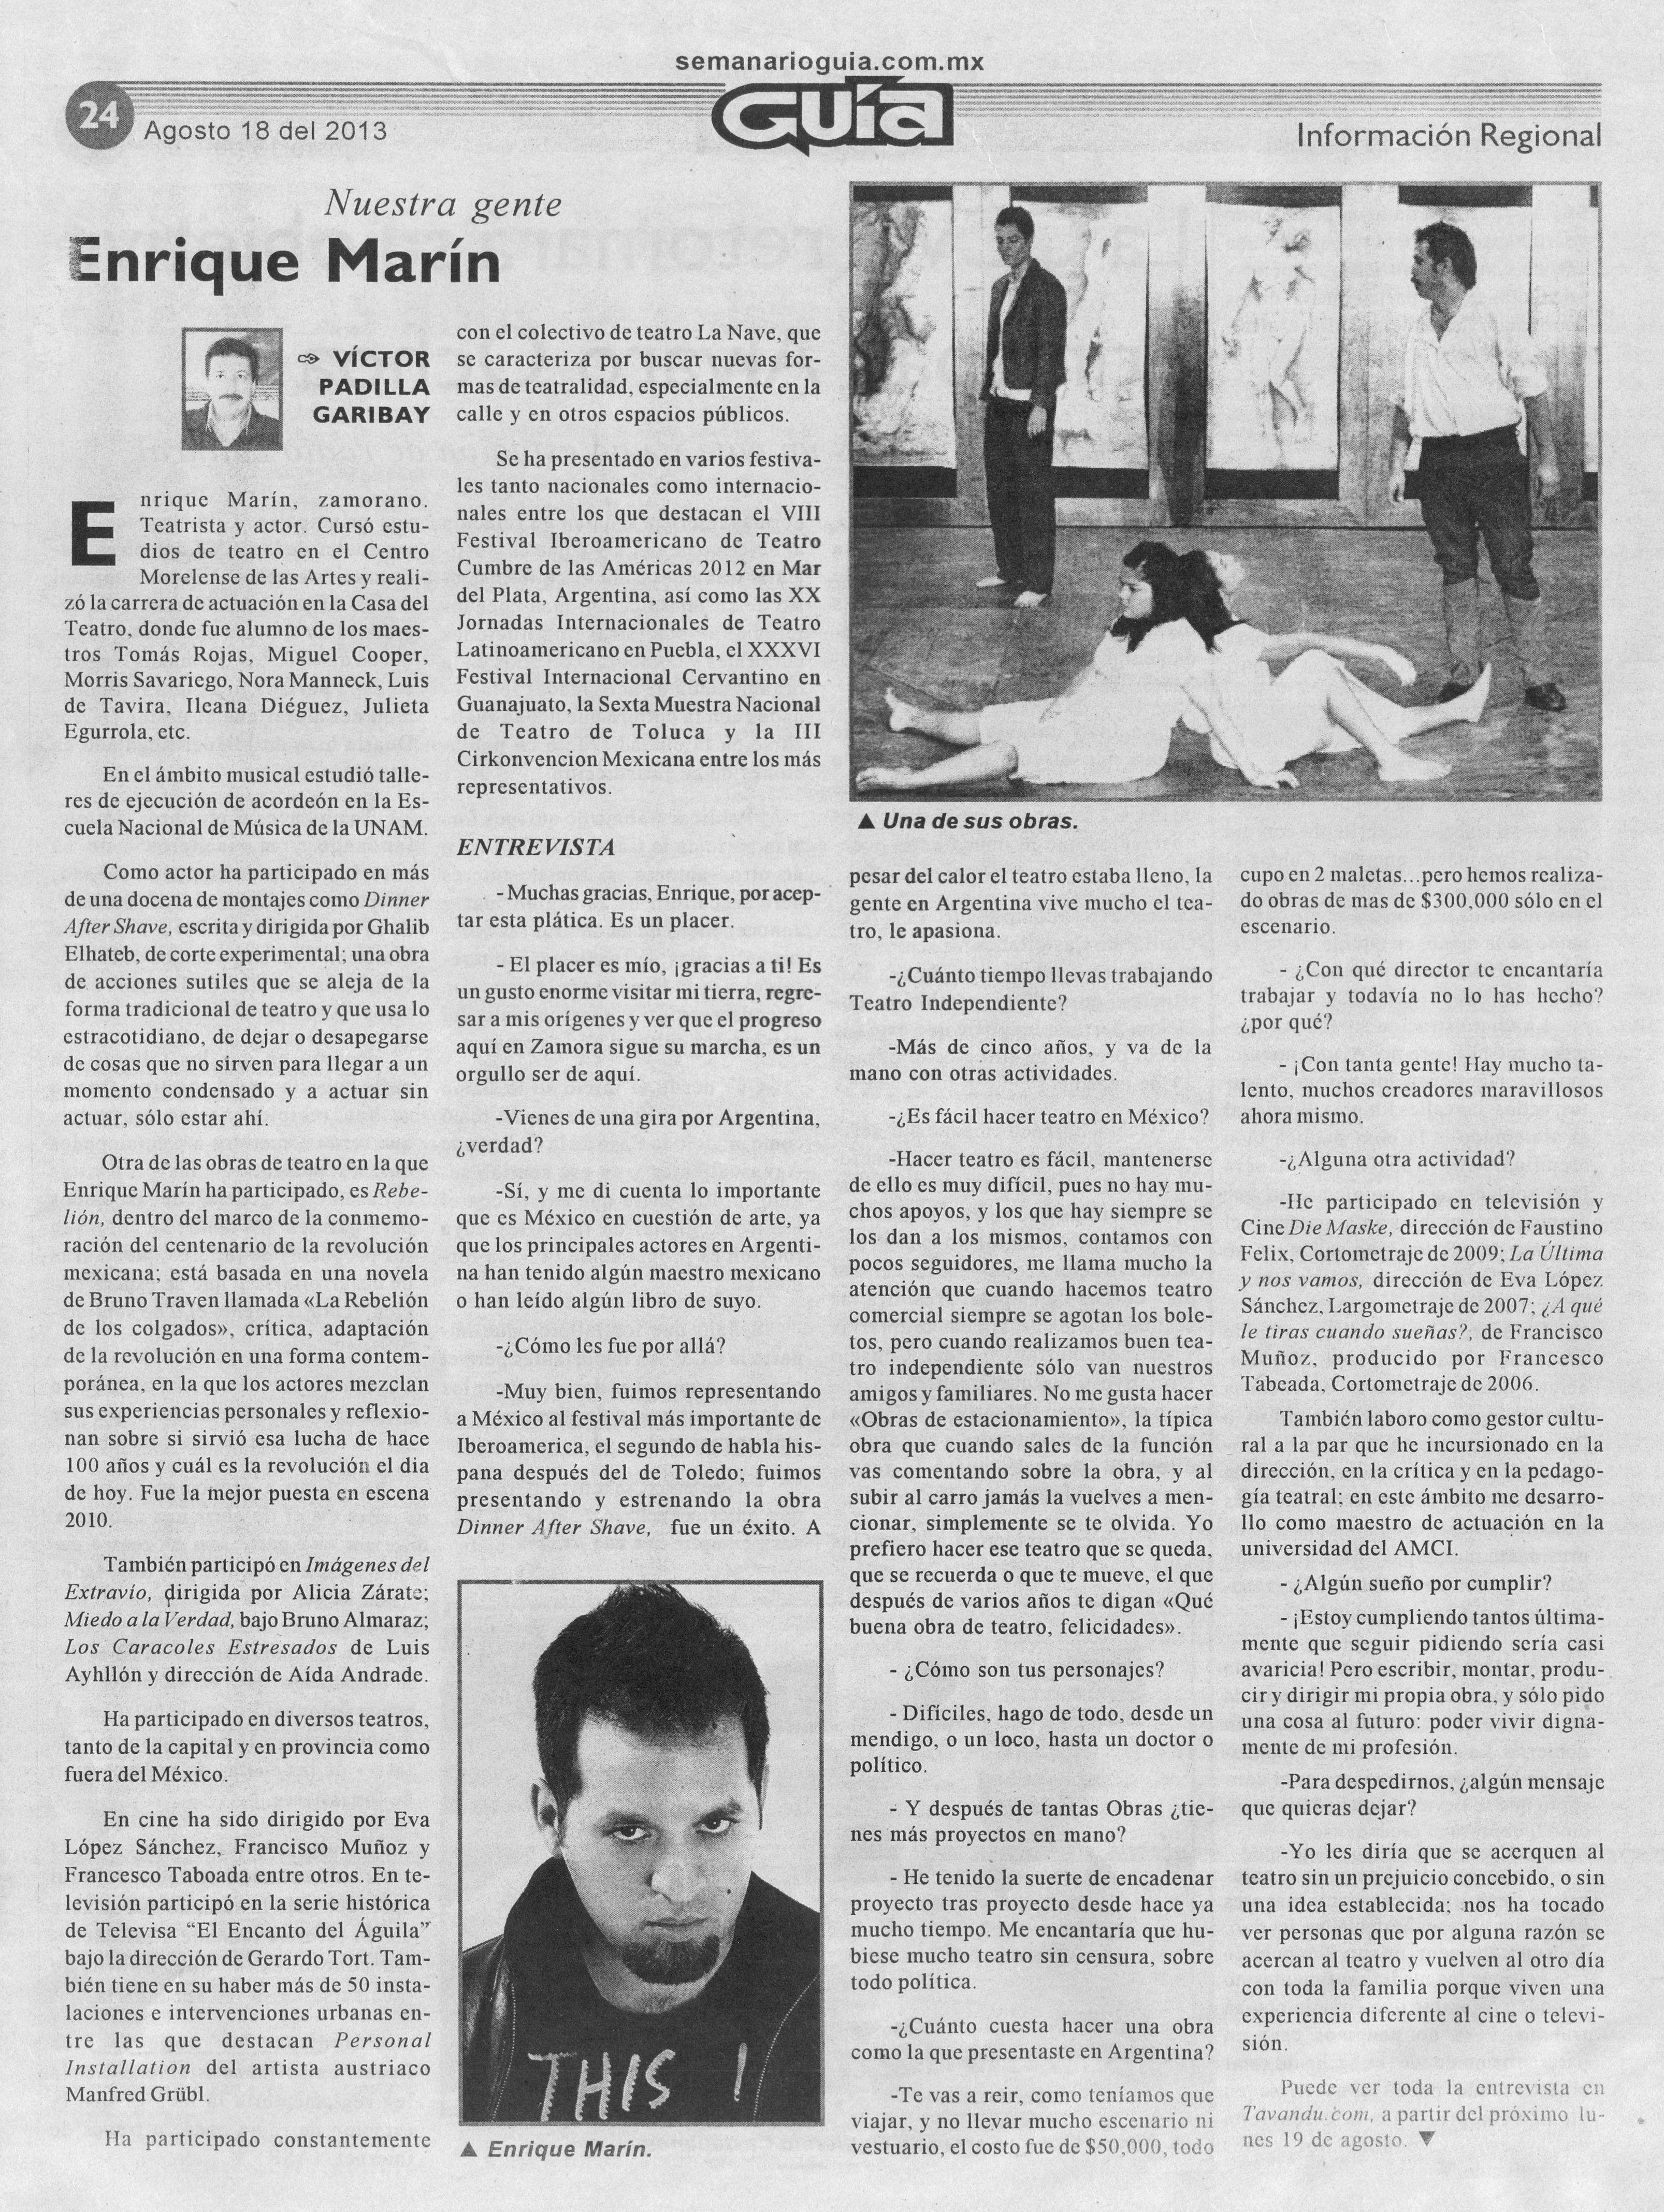 2013 Entrevista de Enrique en Guia